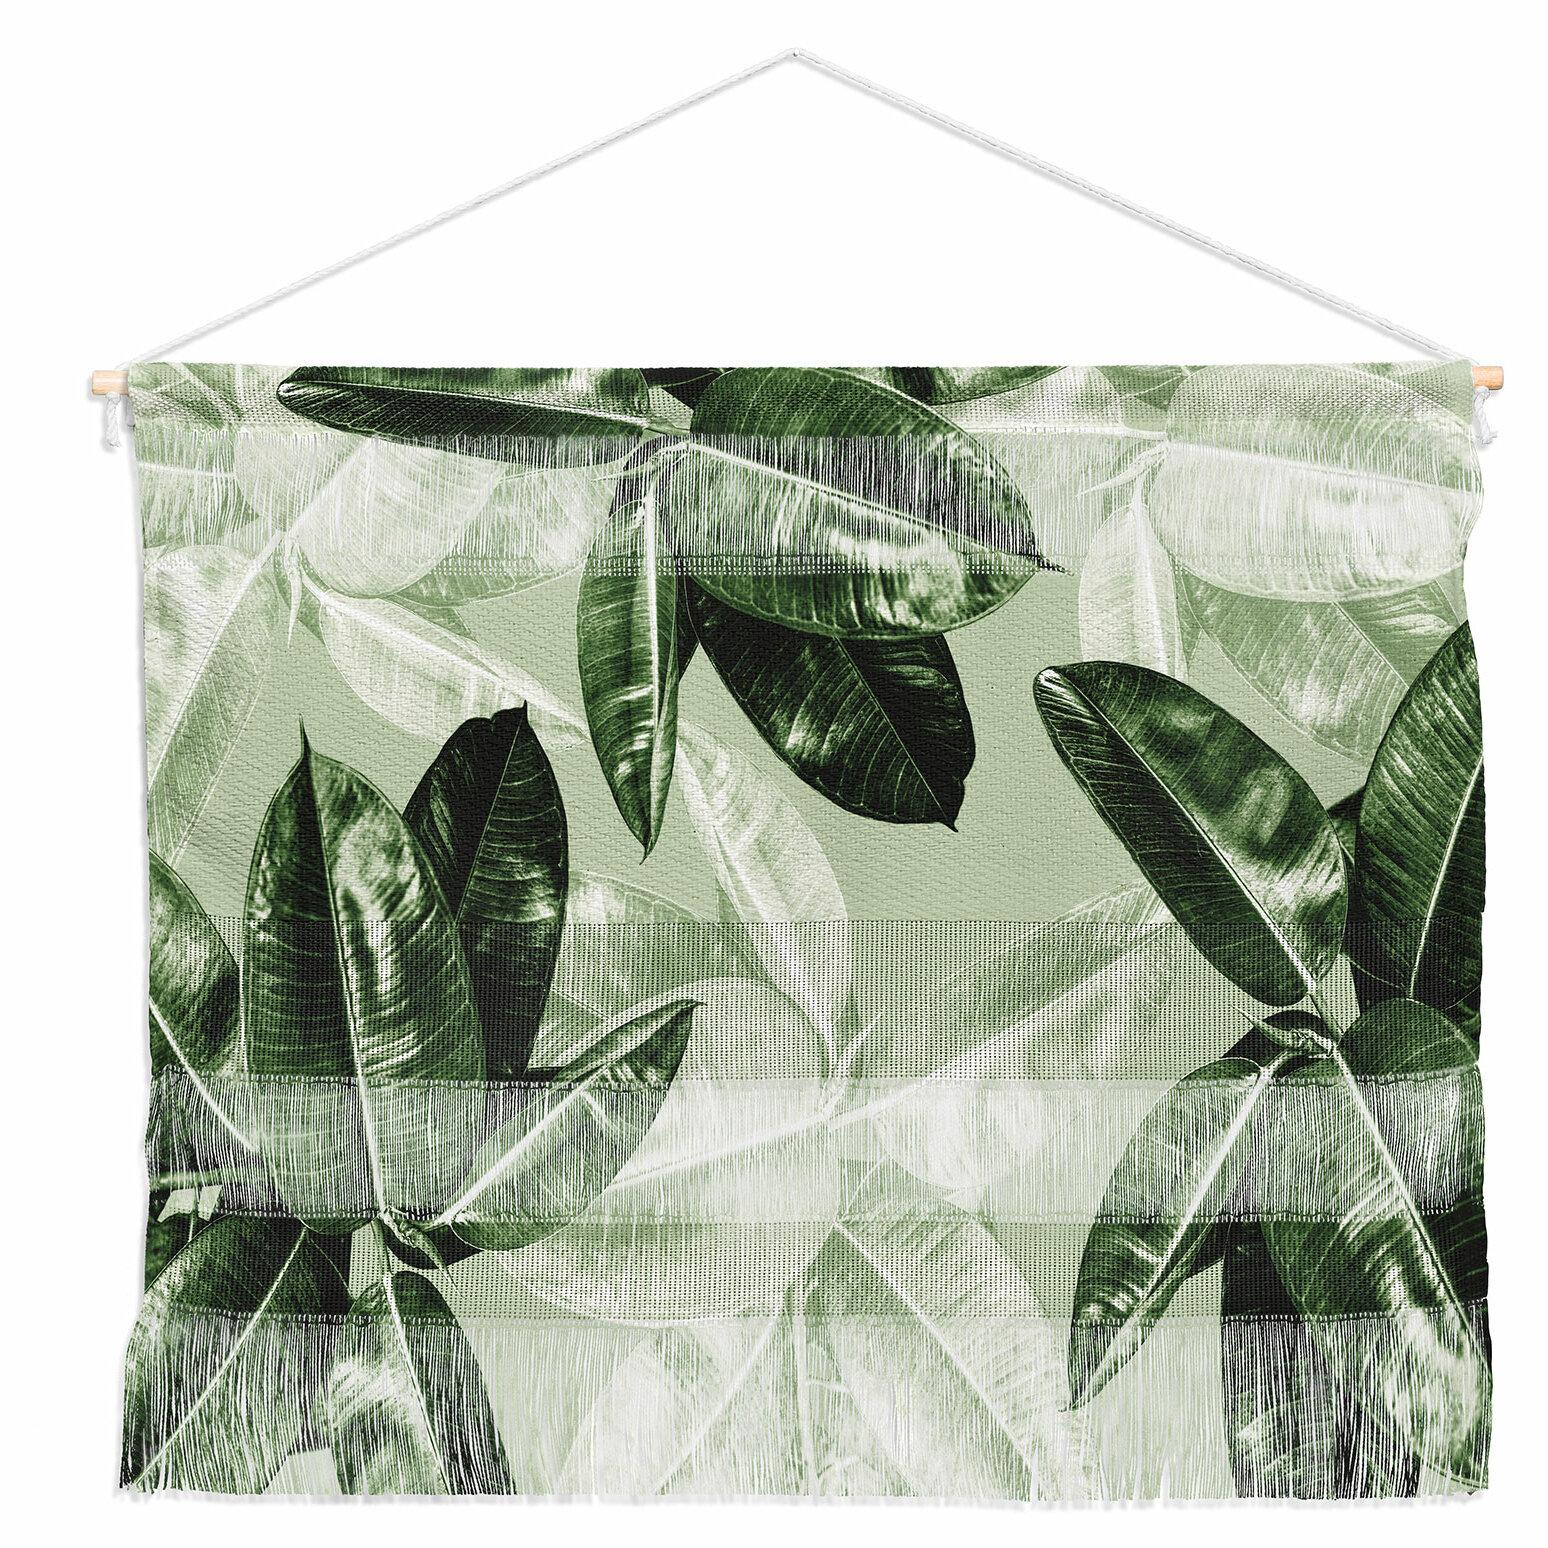 East Urban Home Green Tropical Leaves By Magda Opoka Wall Hanging